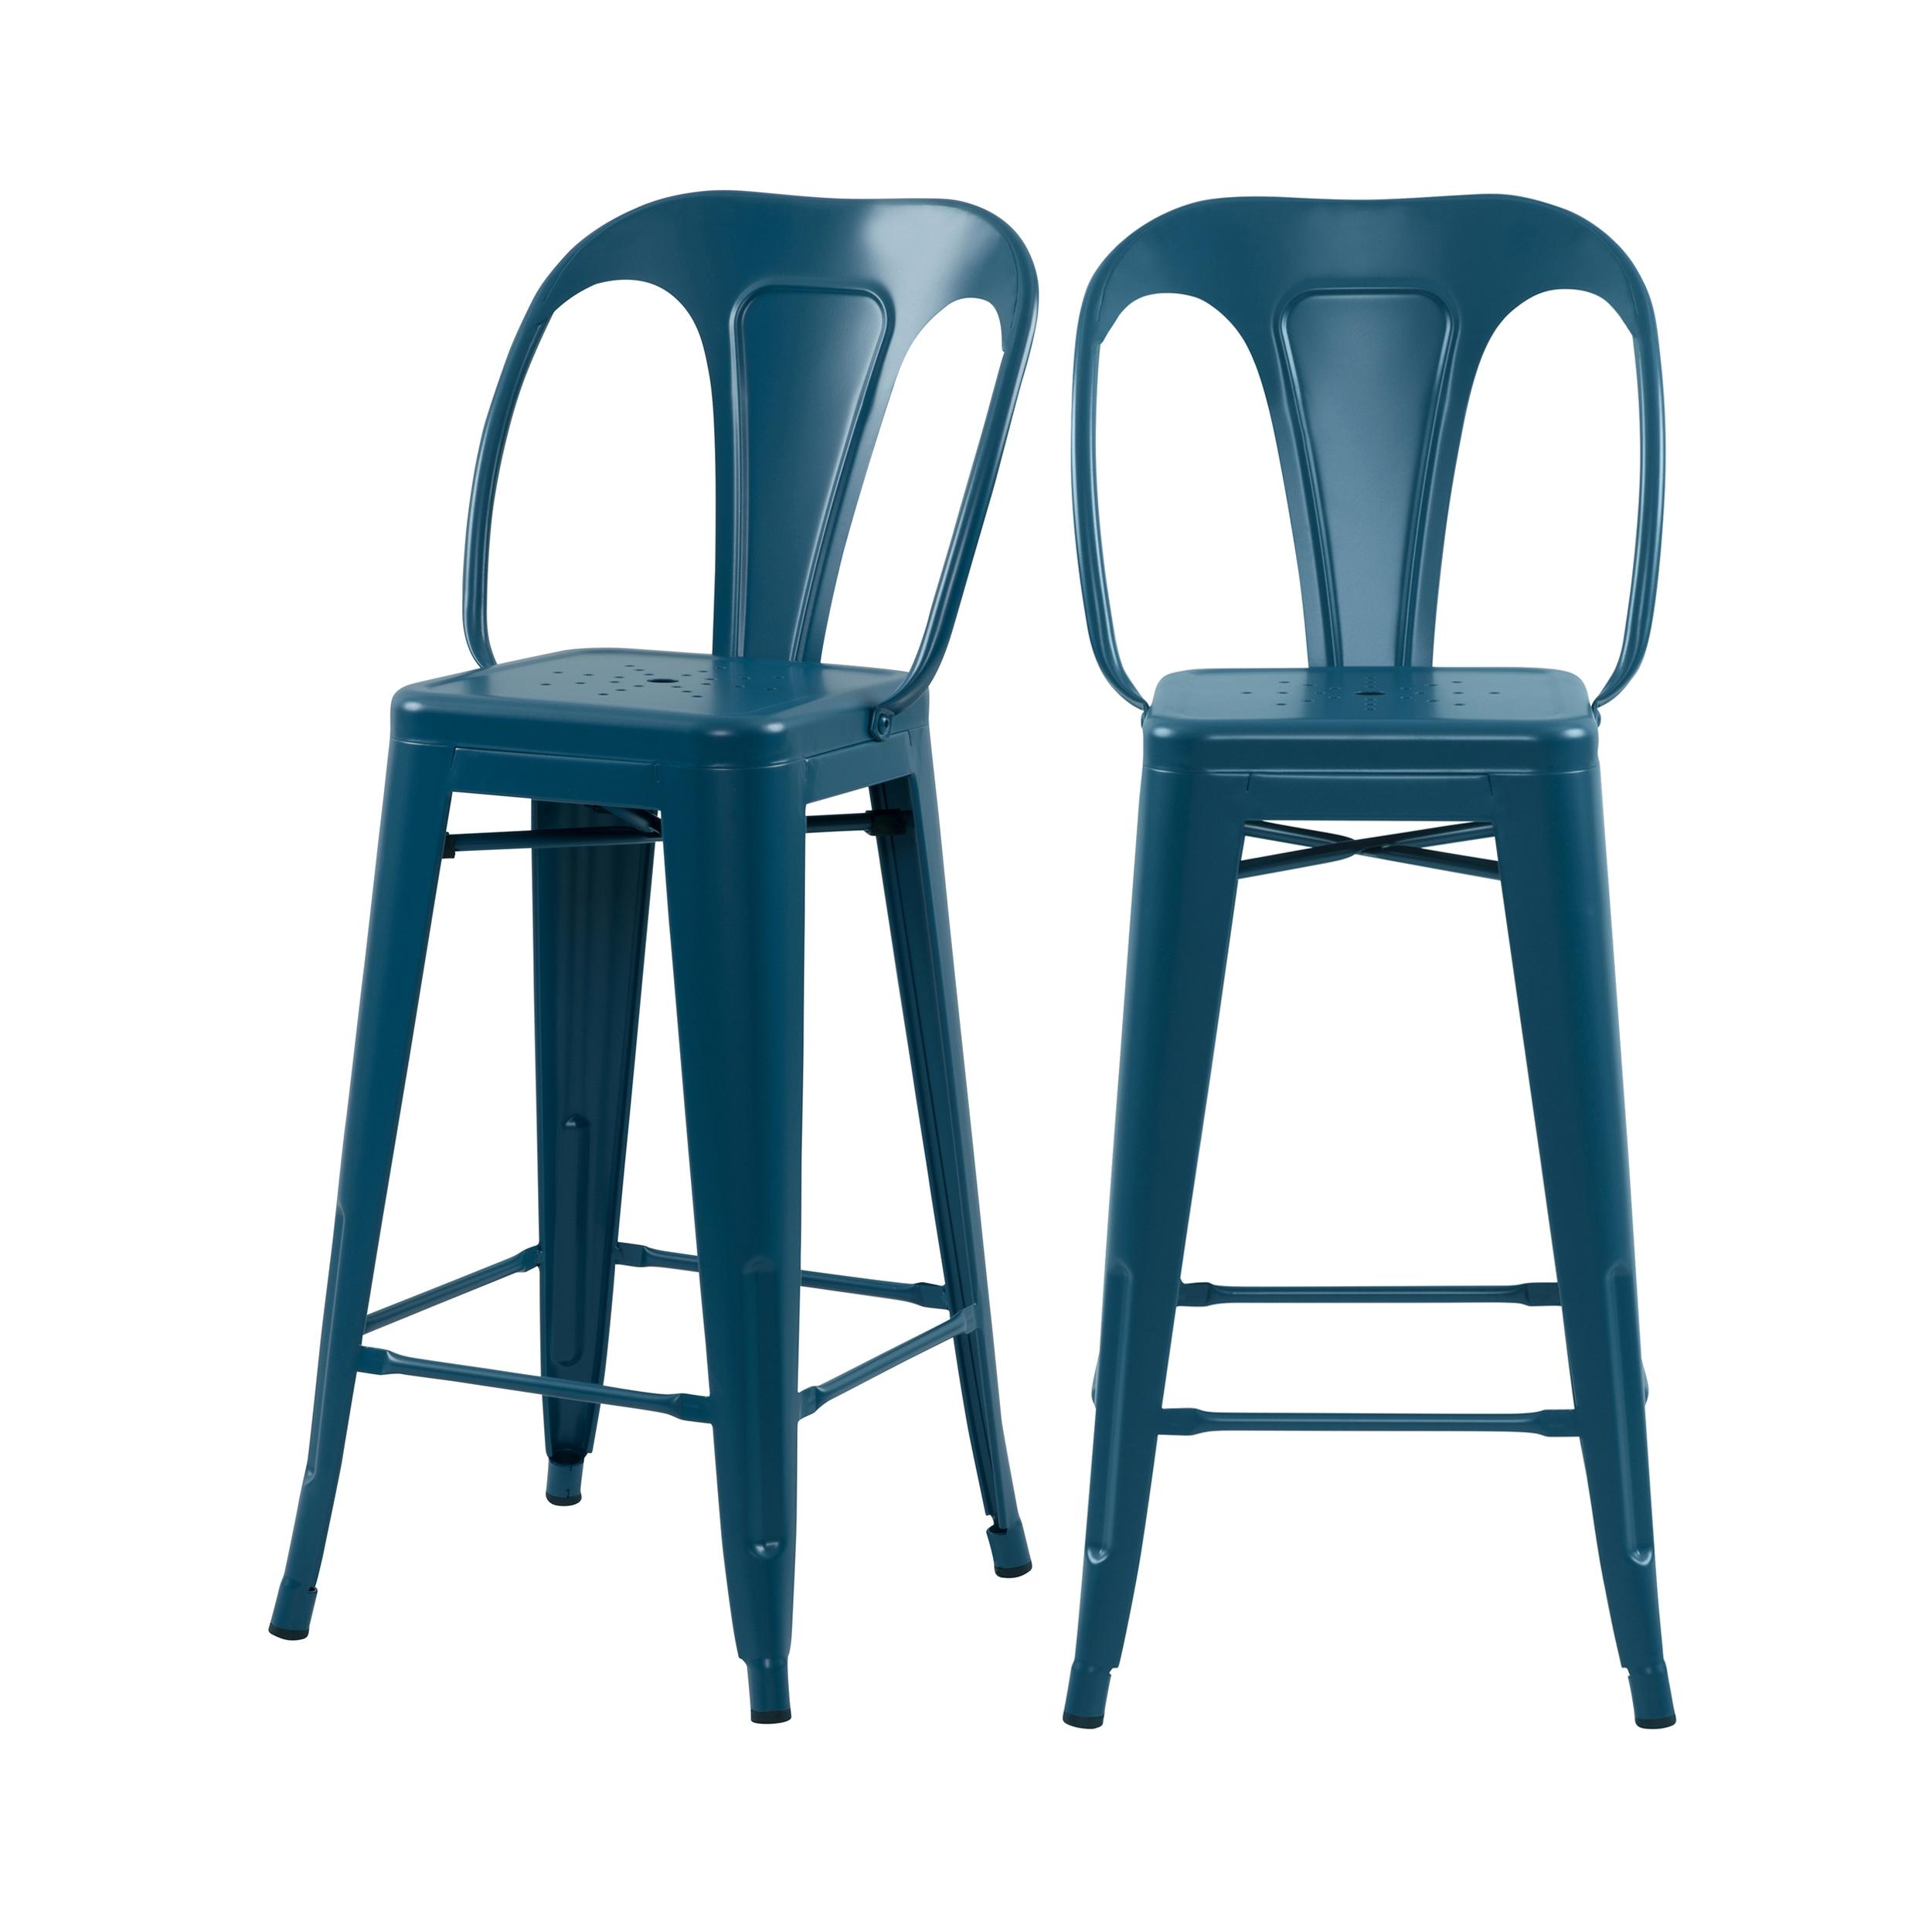 Chaise de bar mi-hauteur 66 cm en métal bleu mat (lot de 2)